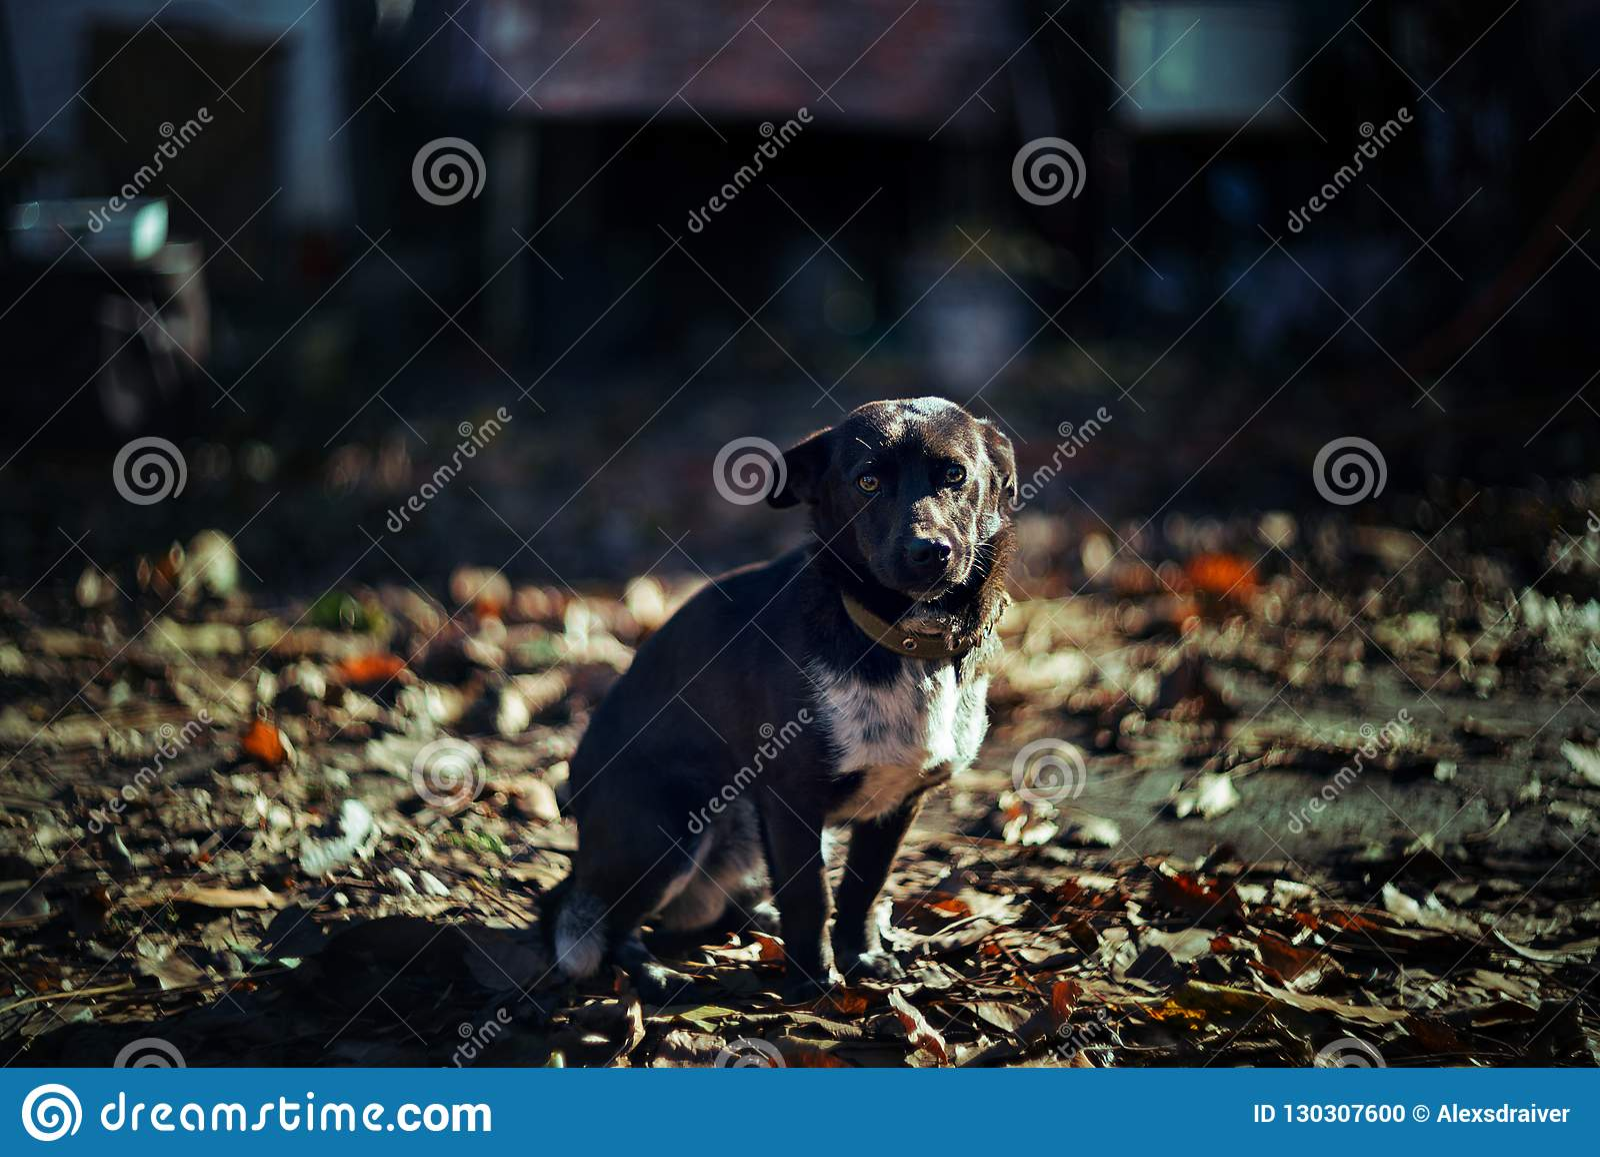 Little dog is shining